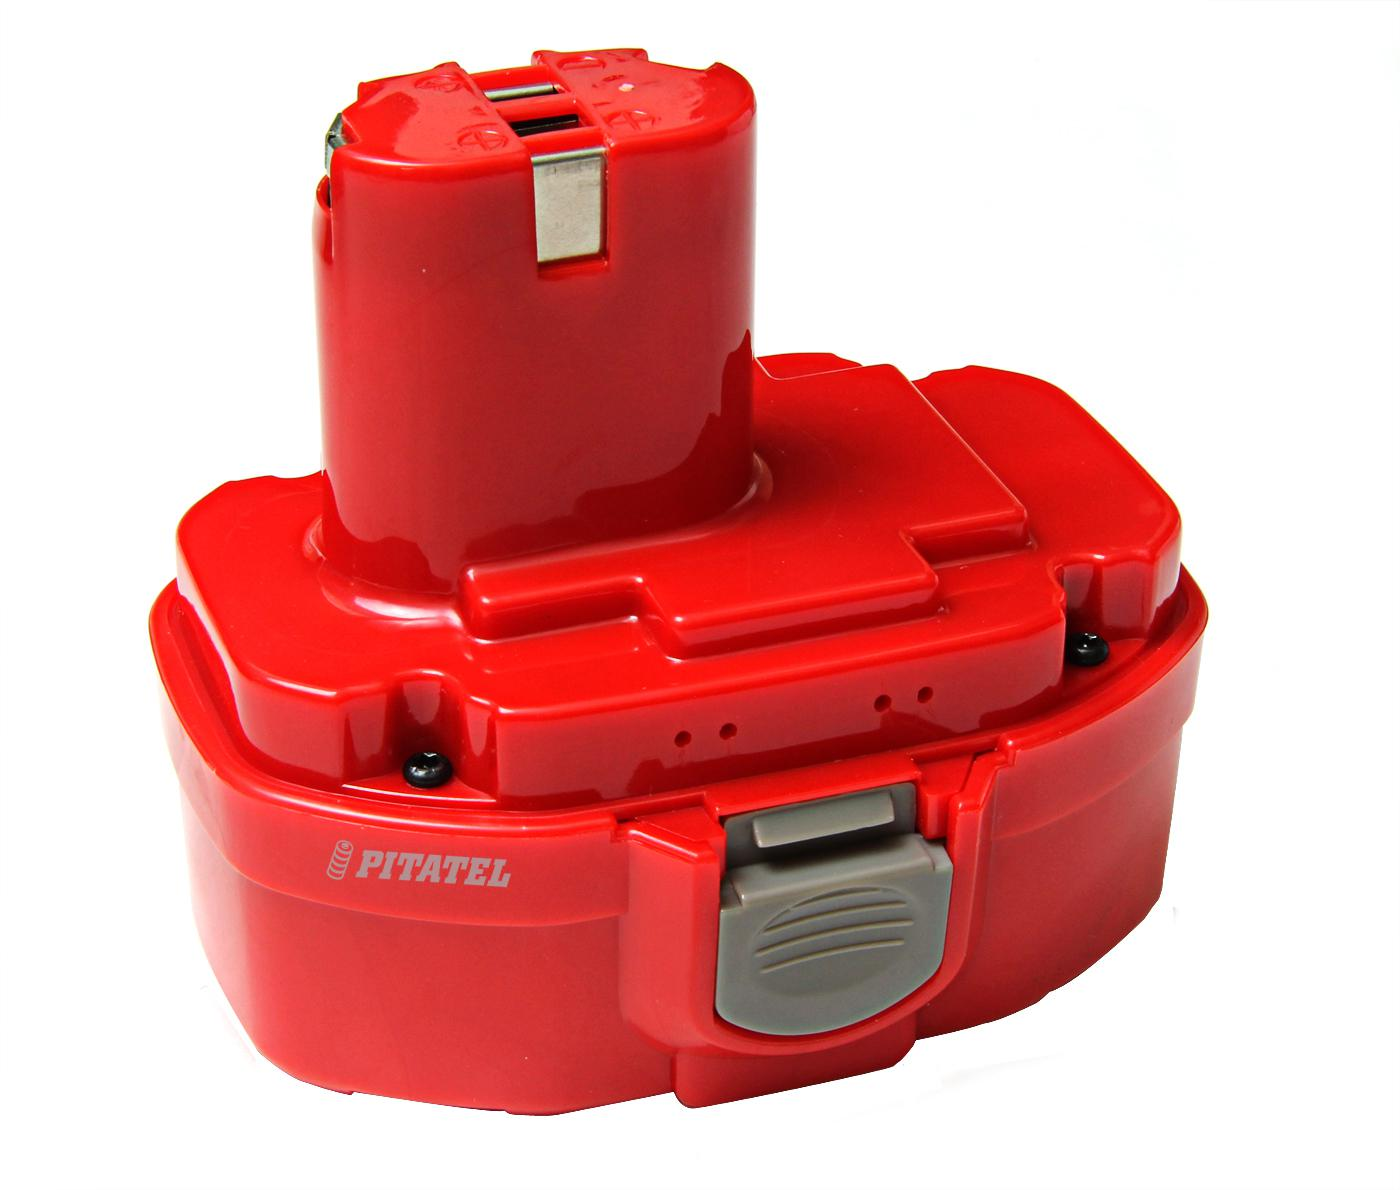 Аккумулятор Pitatel Tsb-033-mak18a-15c